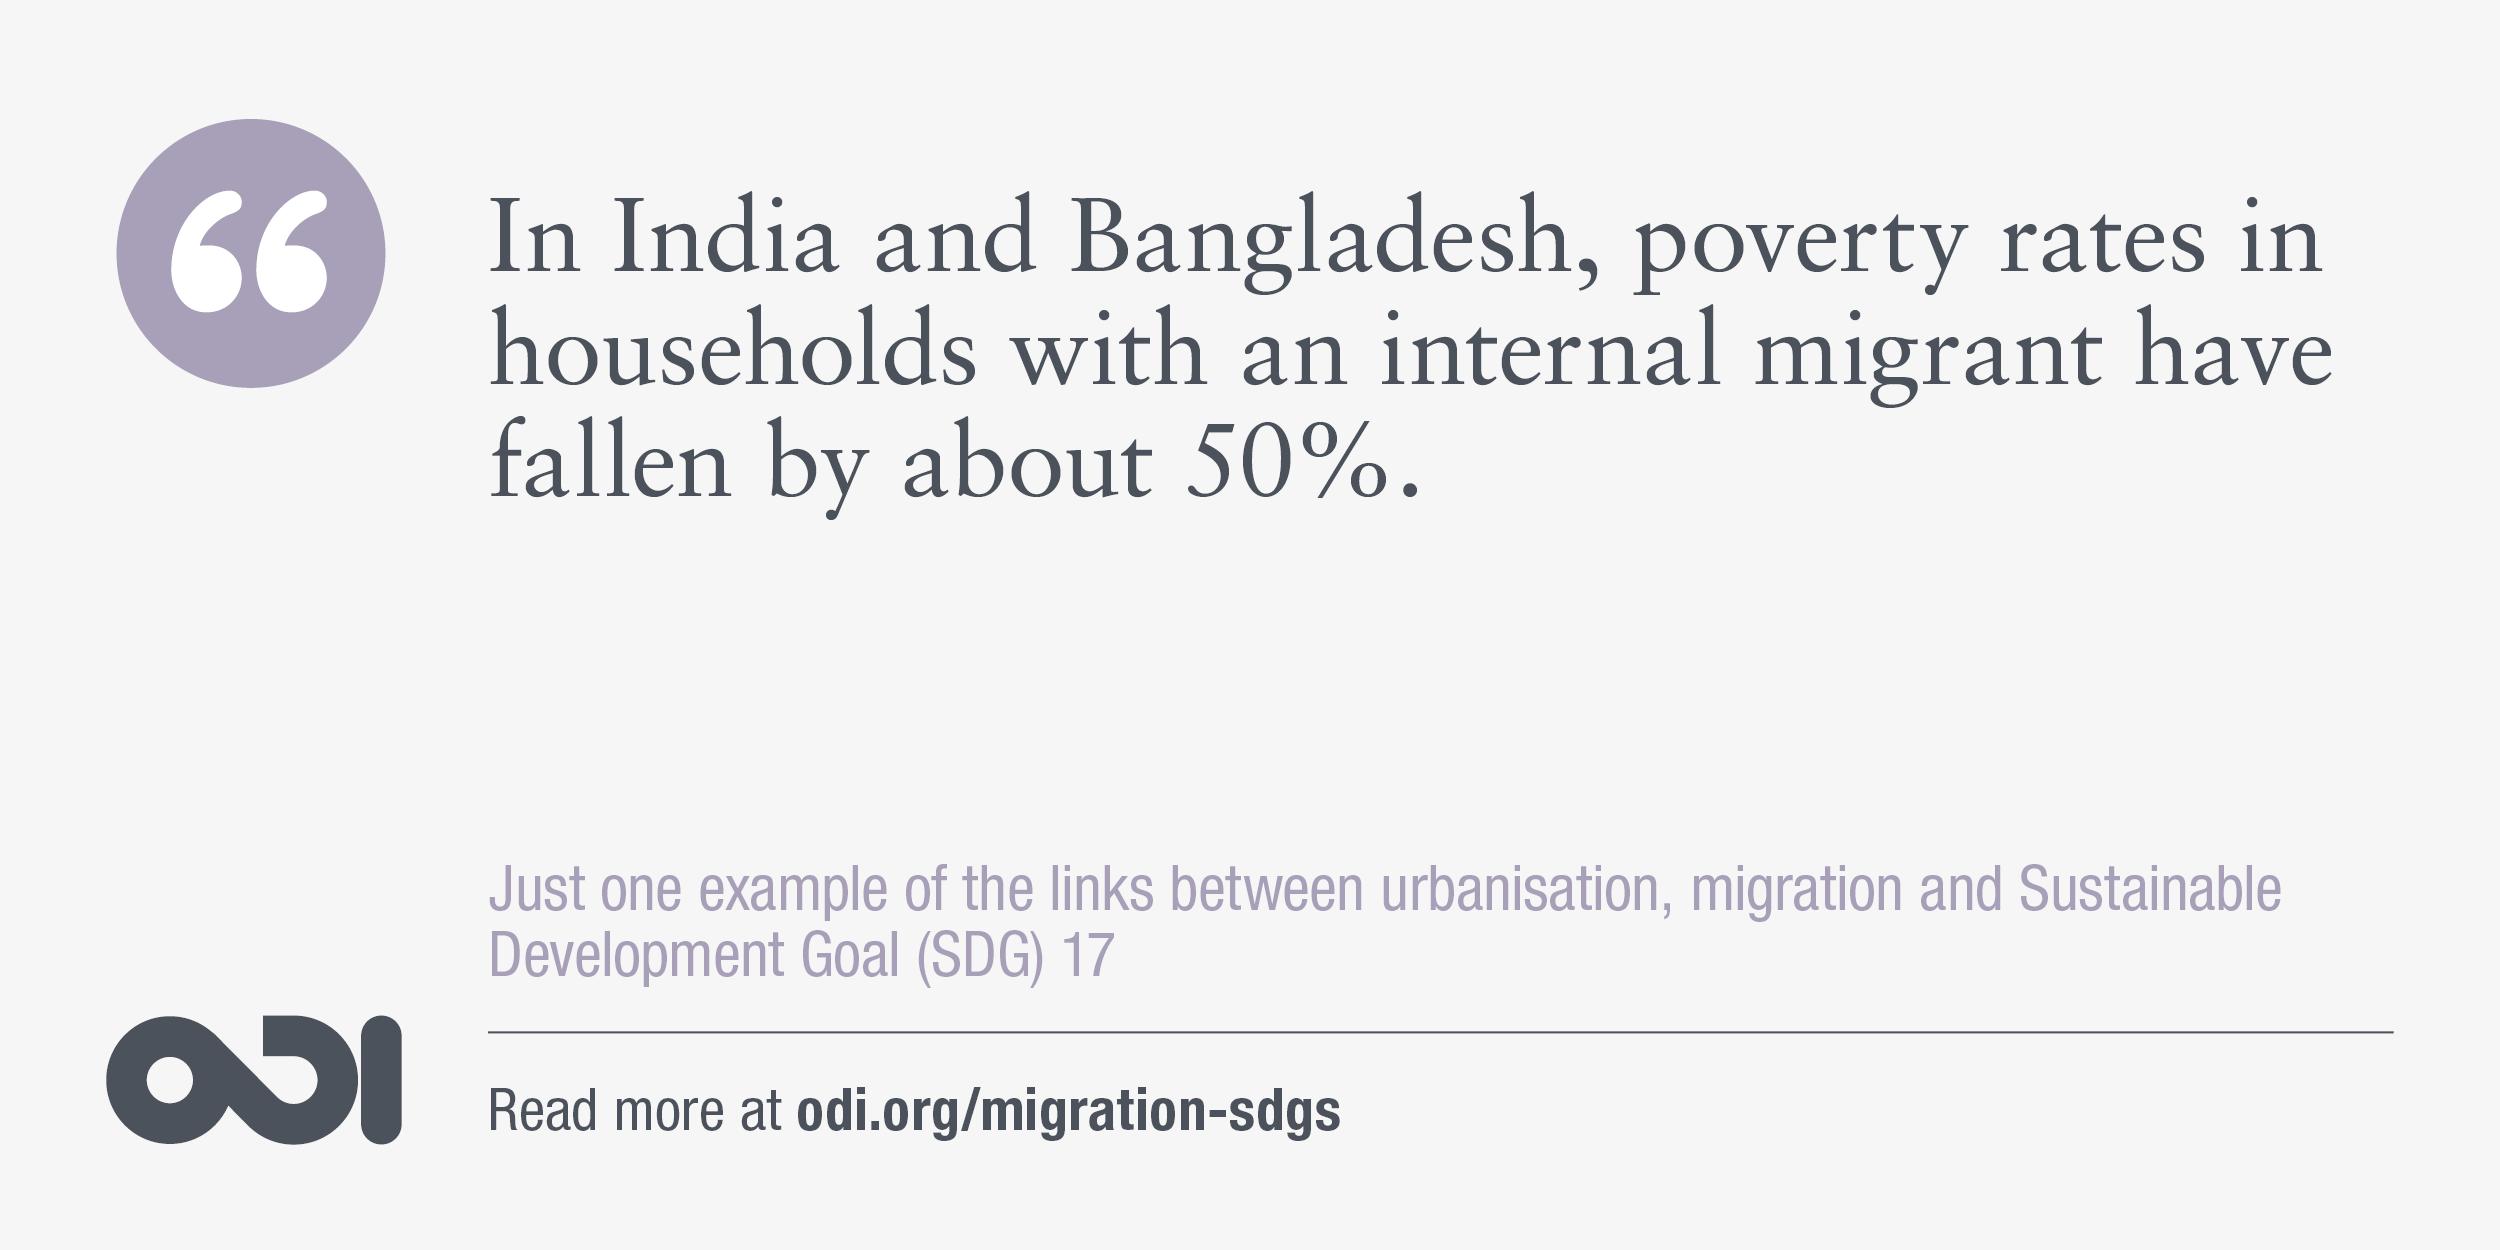 The links between urbanisation, migration and SDG 17.